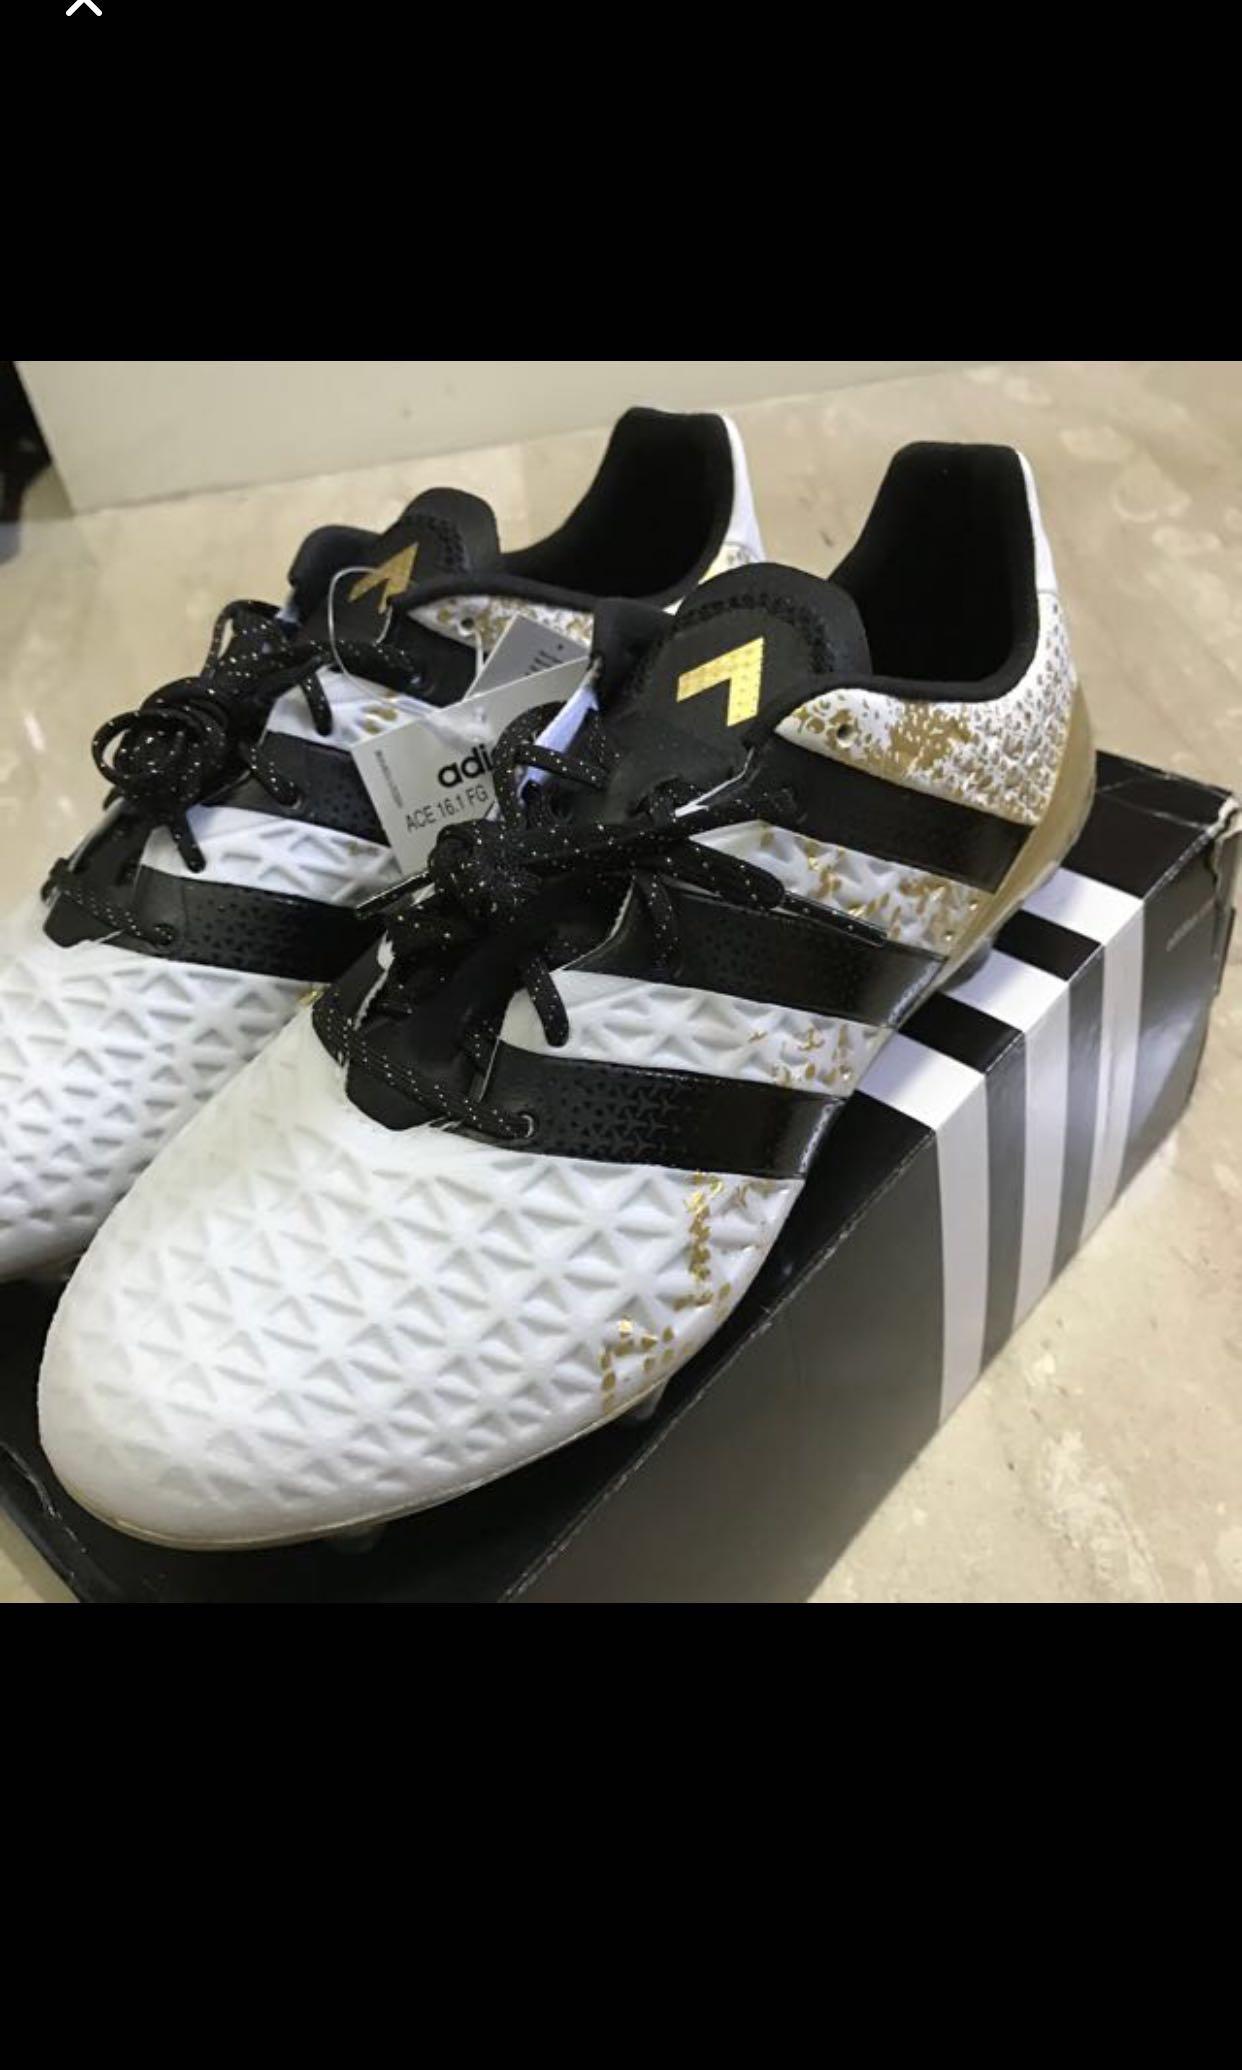 b41fffbe9ff9 Adidas ACE 16.1 FG AG - White Core Black Gold Metallic